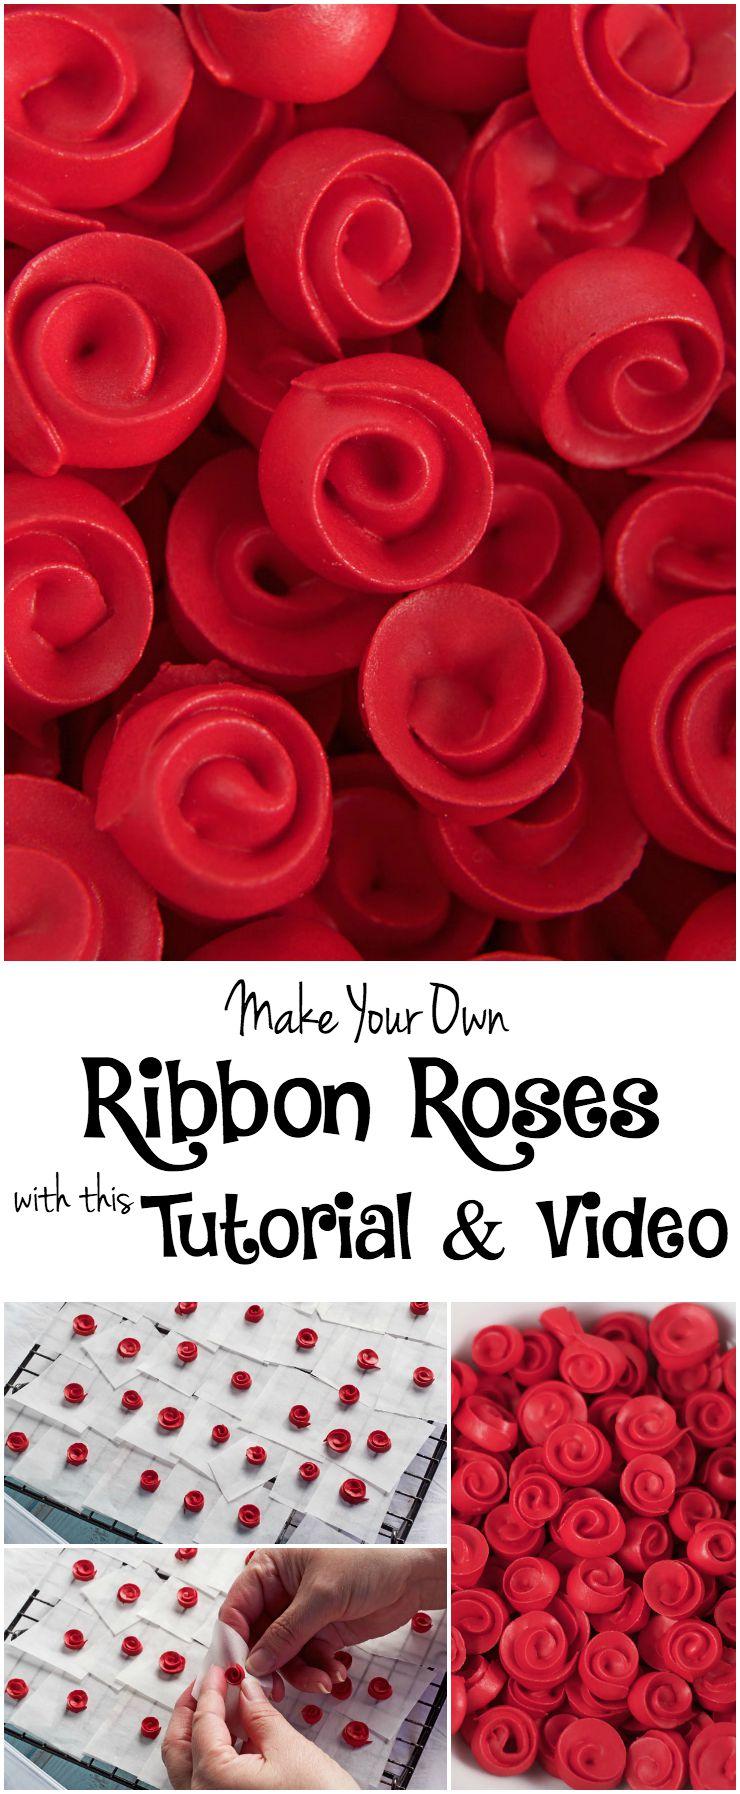 Ribbon Rose Video Tutorial via www.thebearfootbaker.com